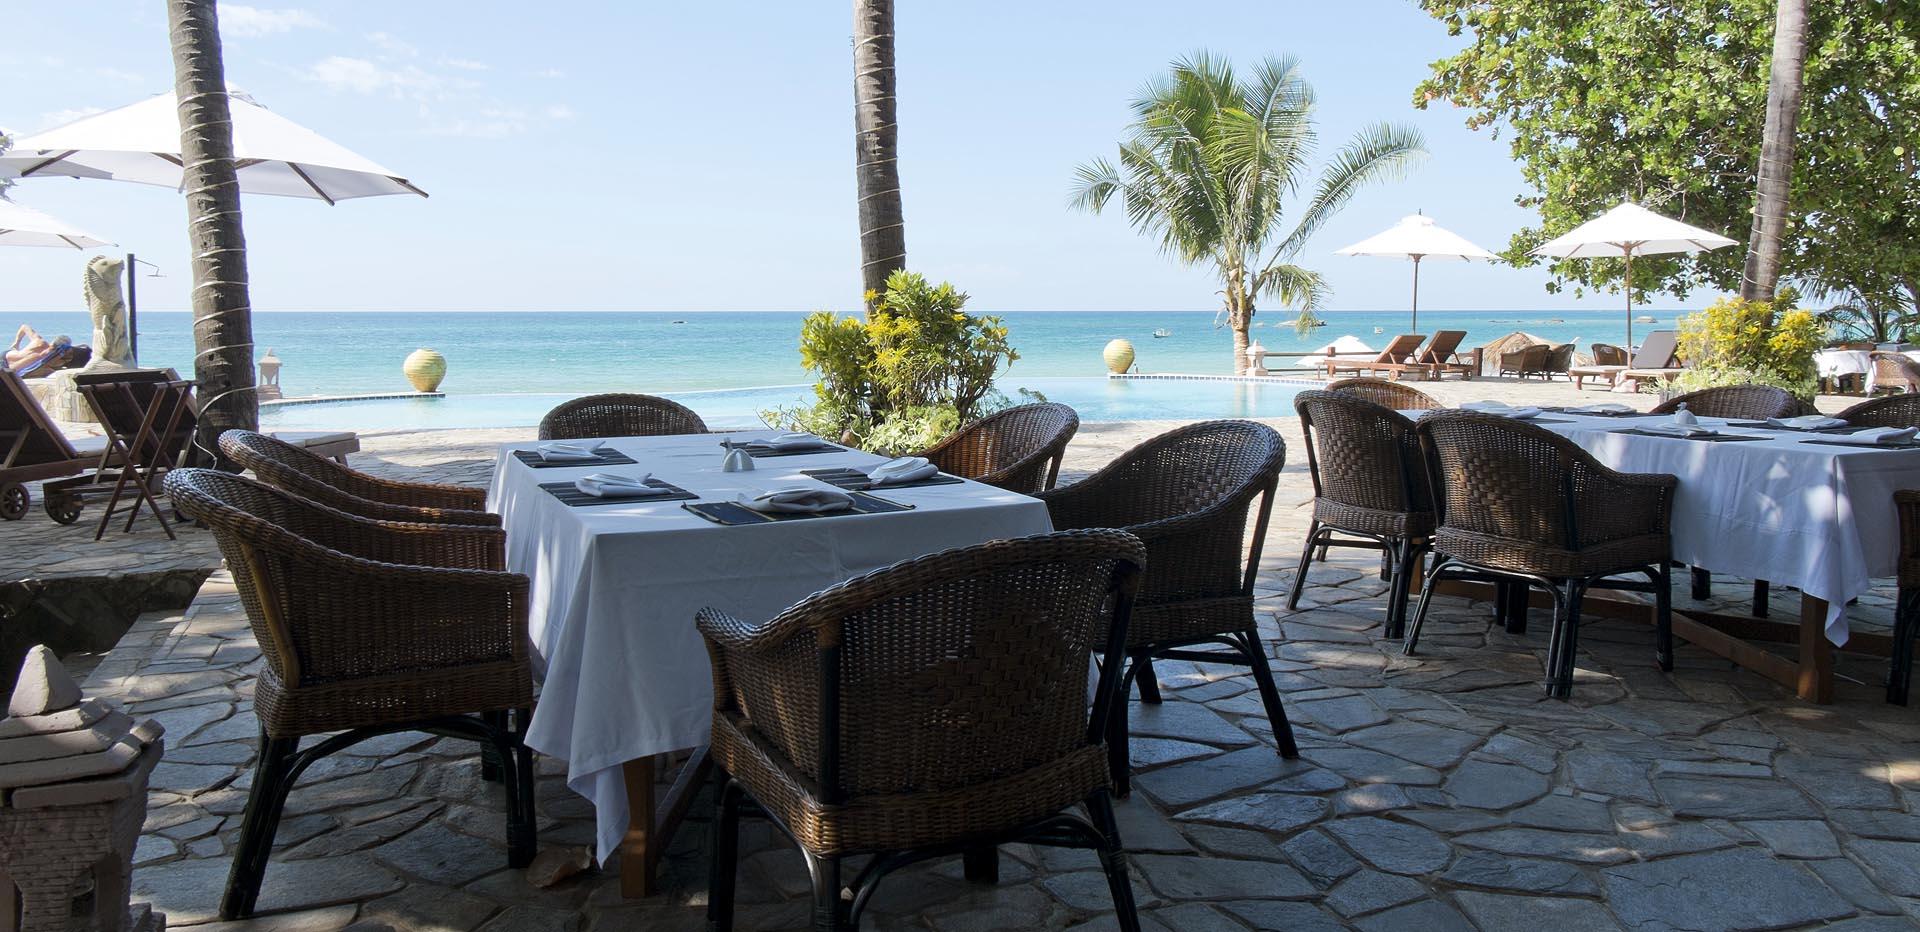 reise-ansichten Ngapali resort